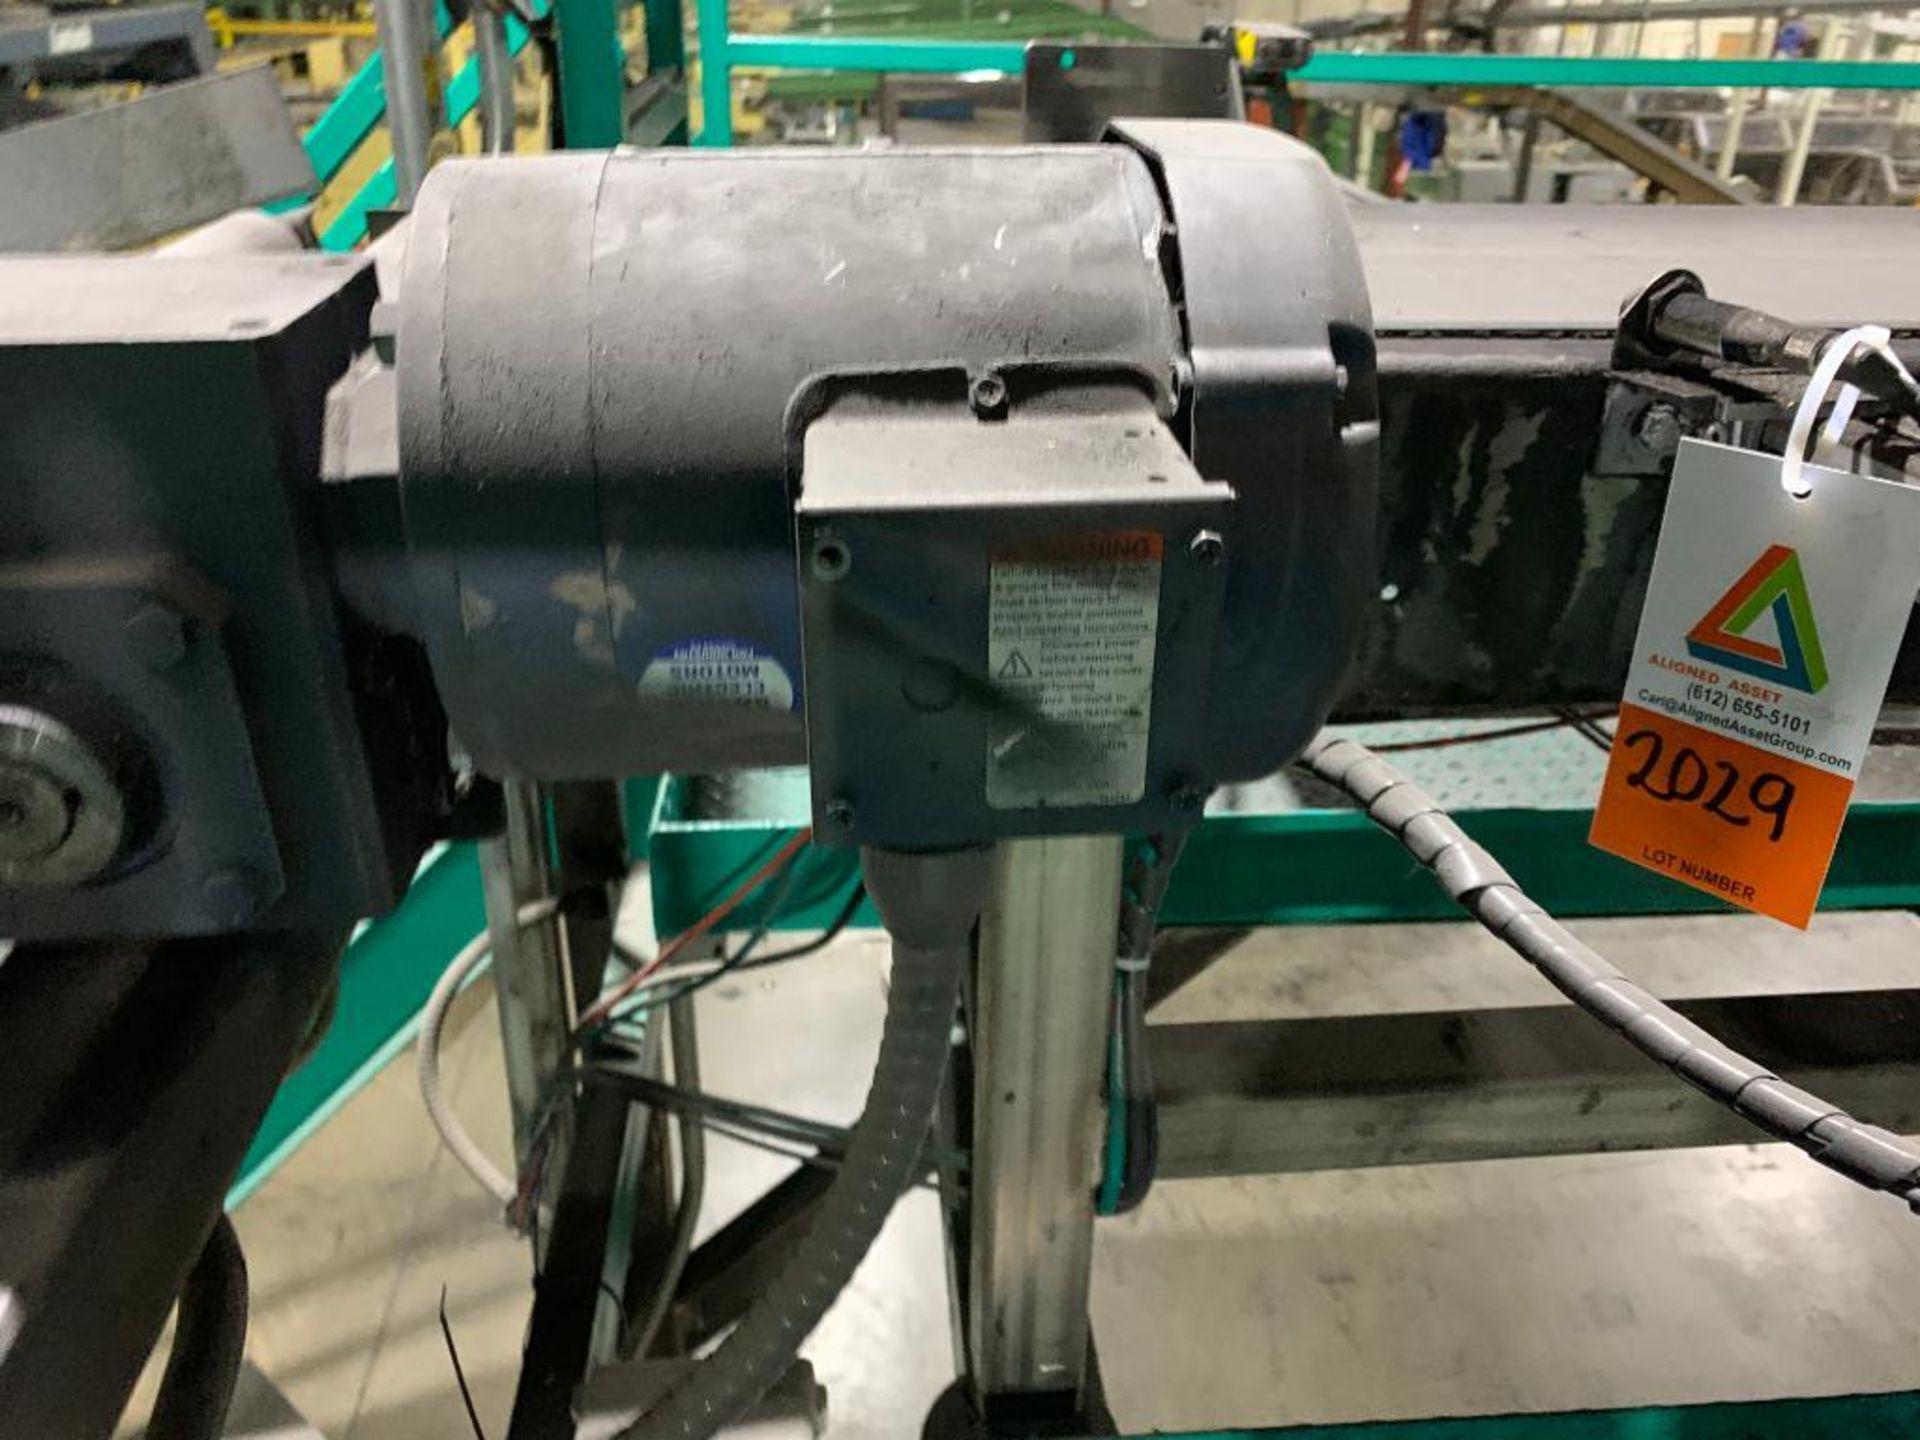 BMI stainless steel conveyor - Image 9 of 14